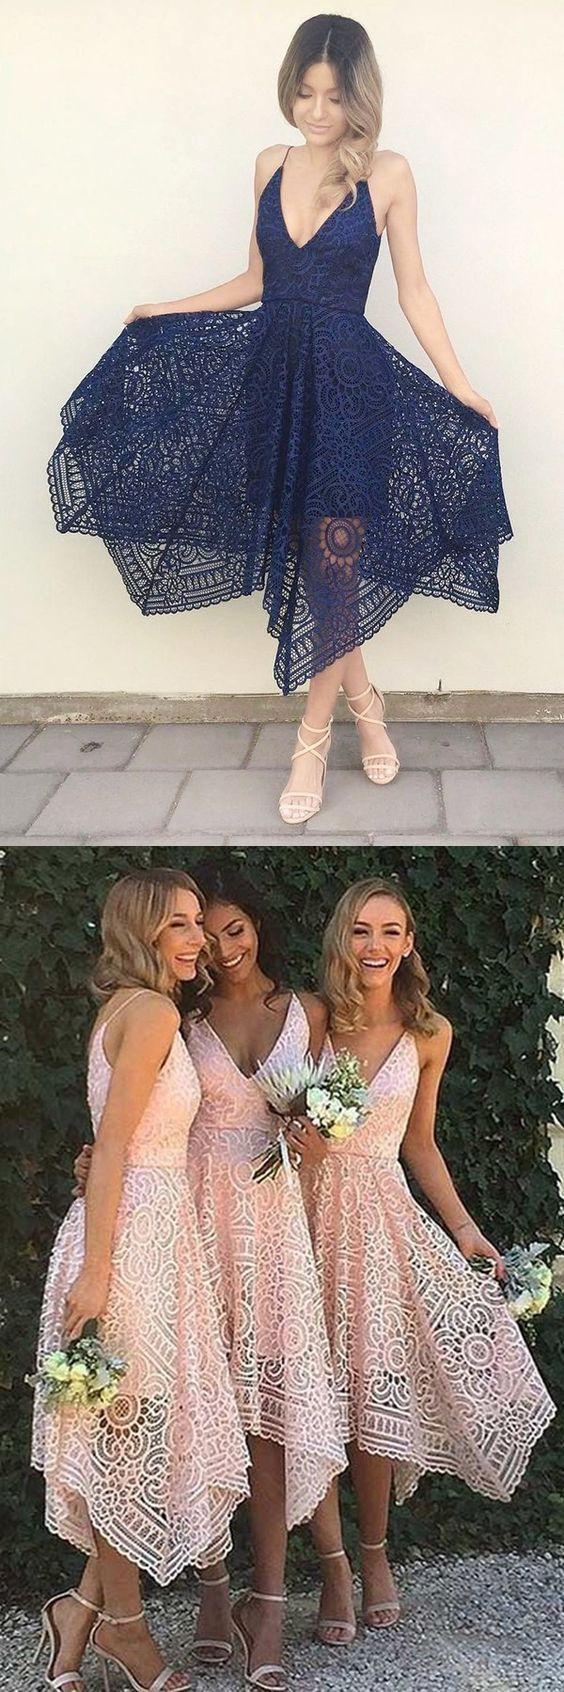 bridesmaid dresses, simple lace bridesmaid dresses, 2017 chic boho style wedding party